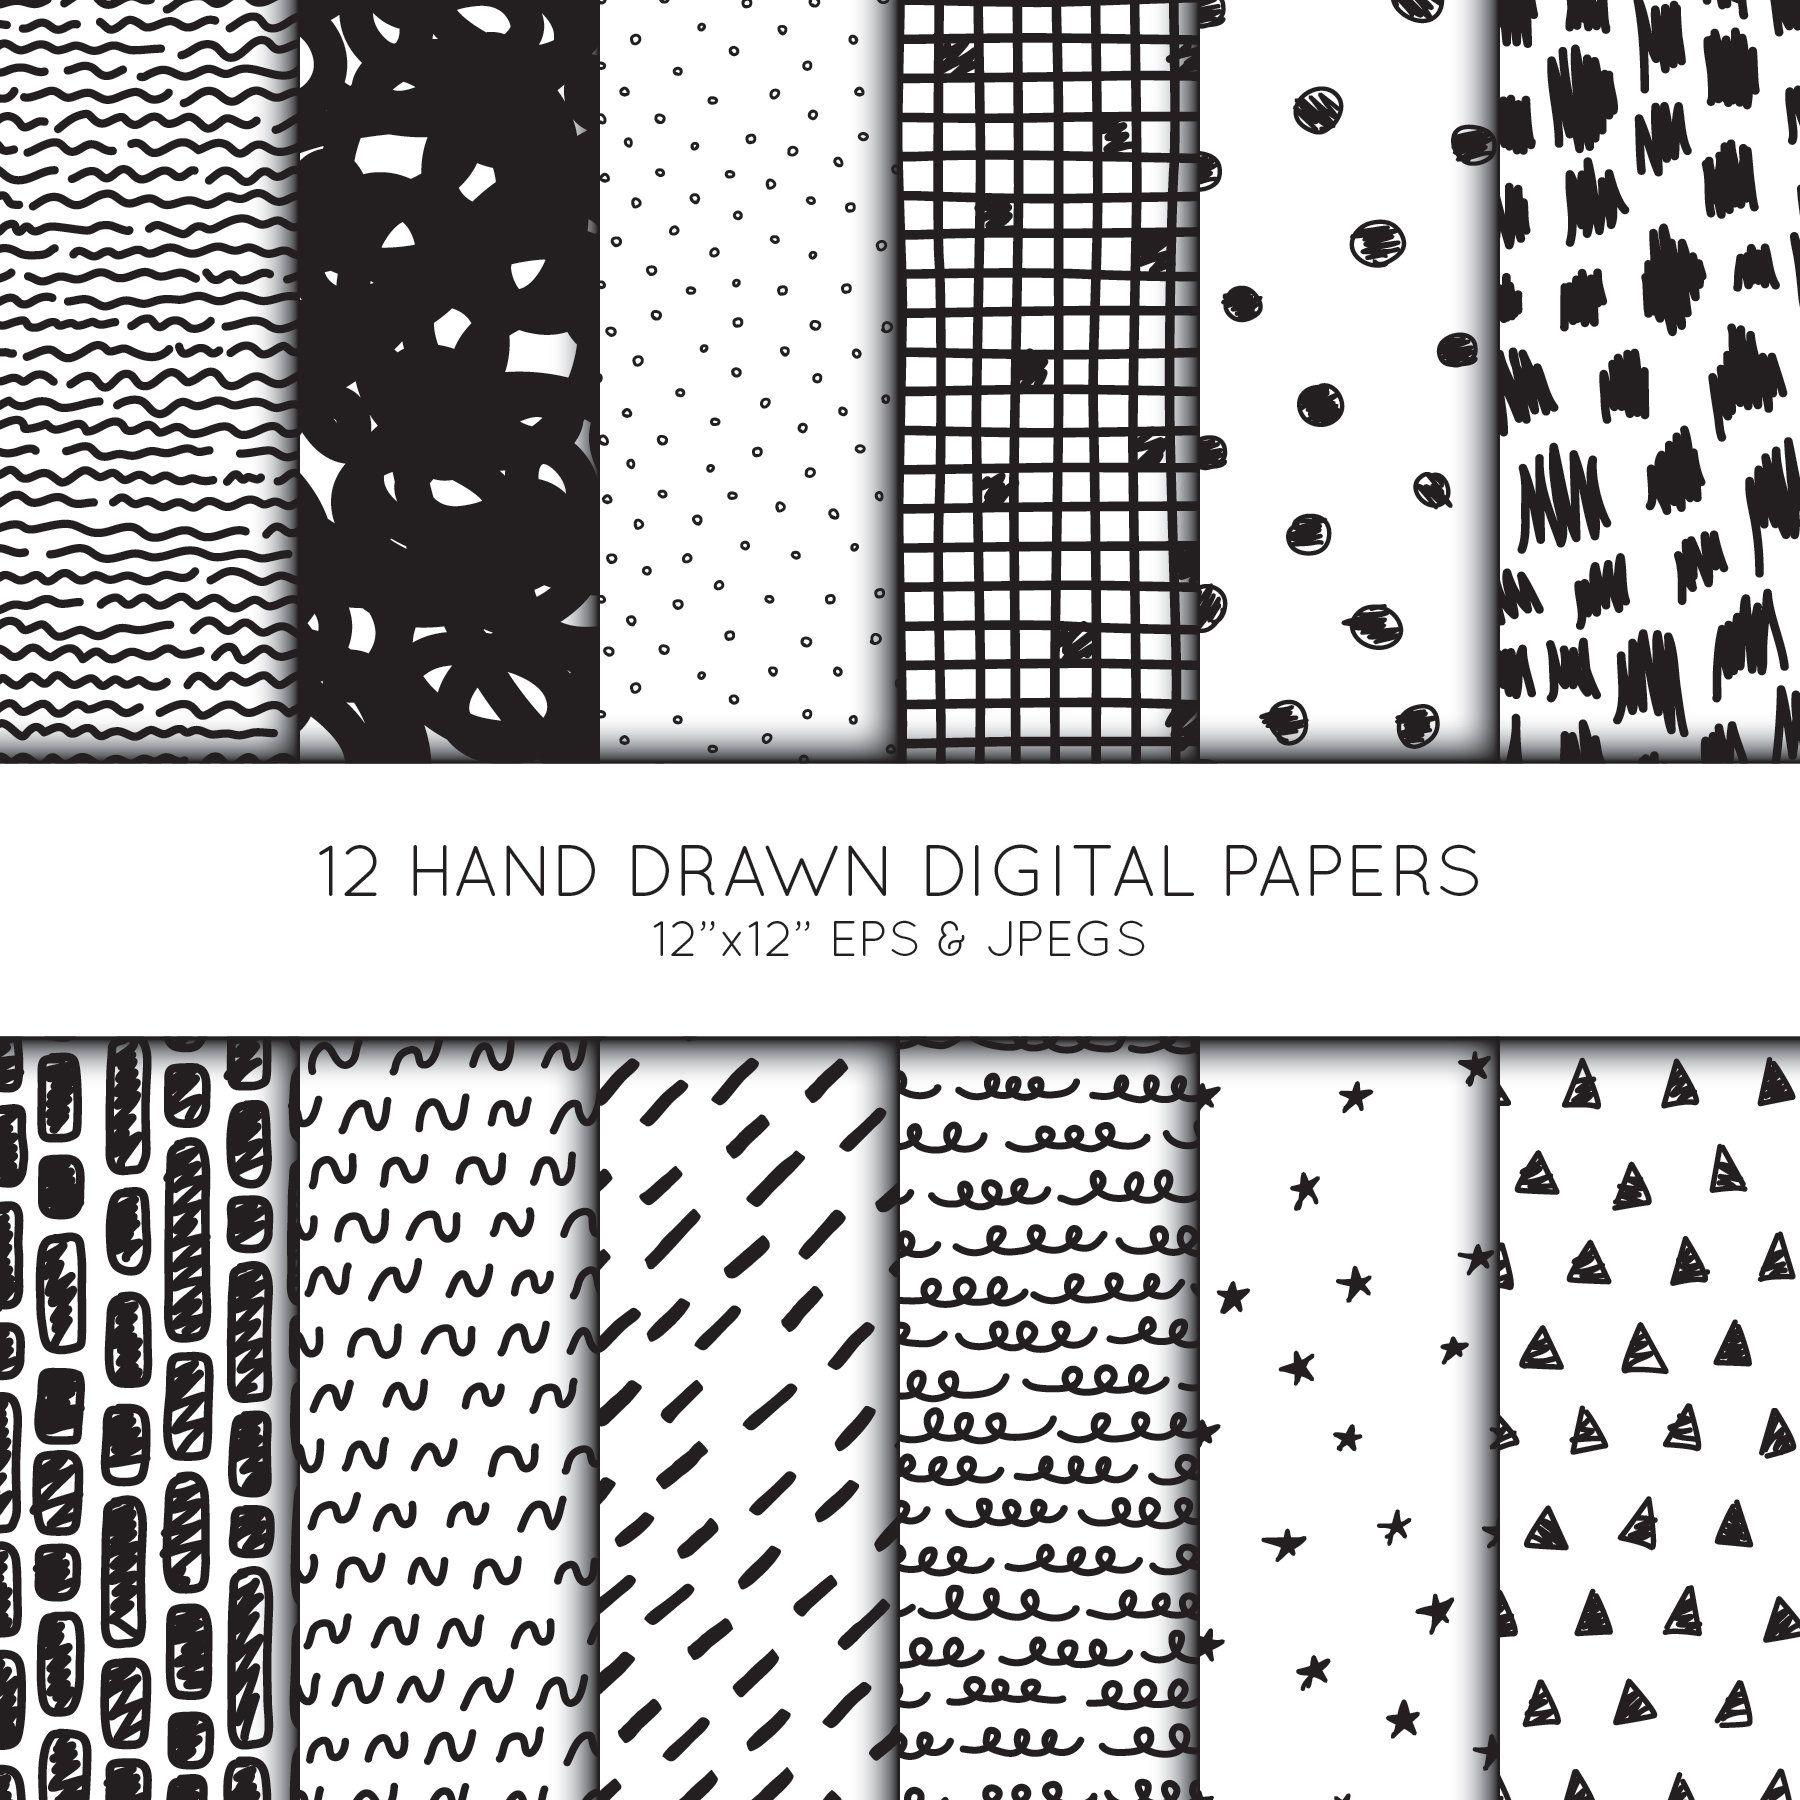 Hand drawn Scrapbook paper, Doodle digital paper,